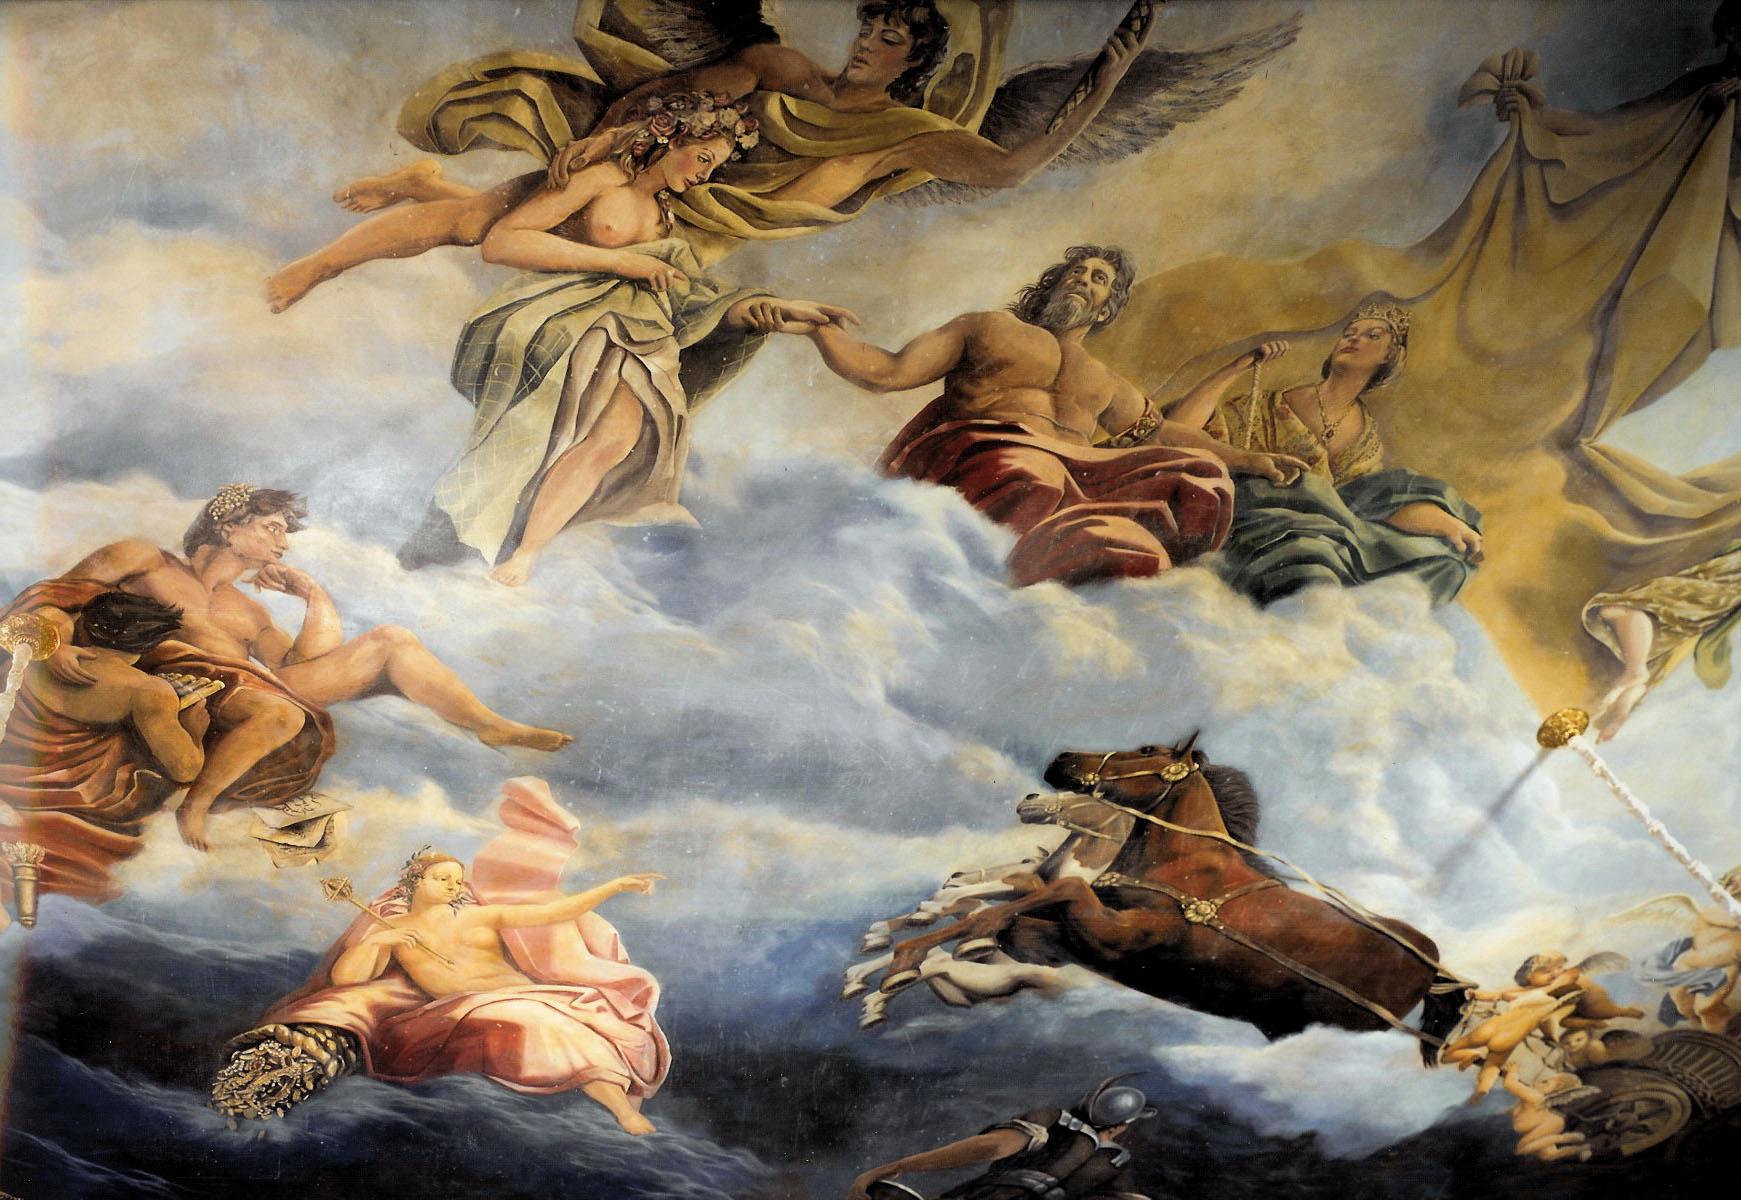 Murals Wall Murals Ceiling Murals Floor Murals Mural Paintings 1741x1200